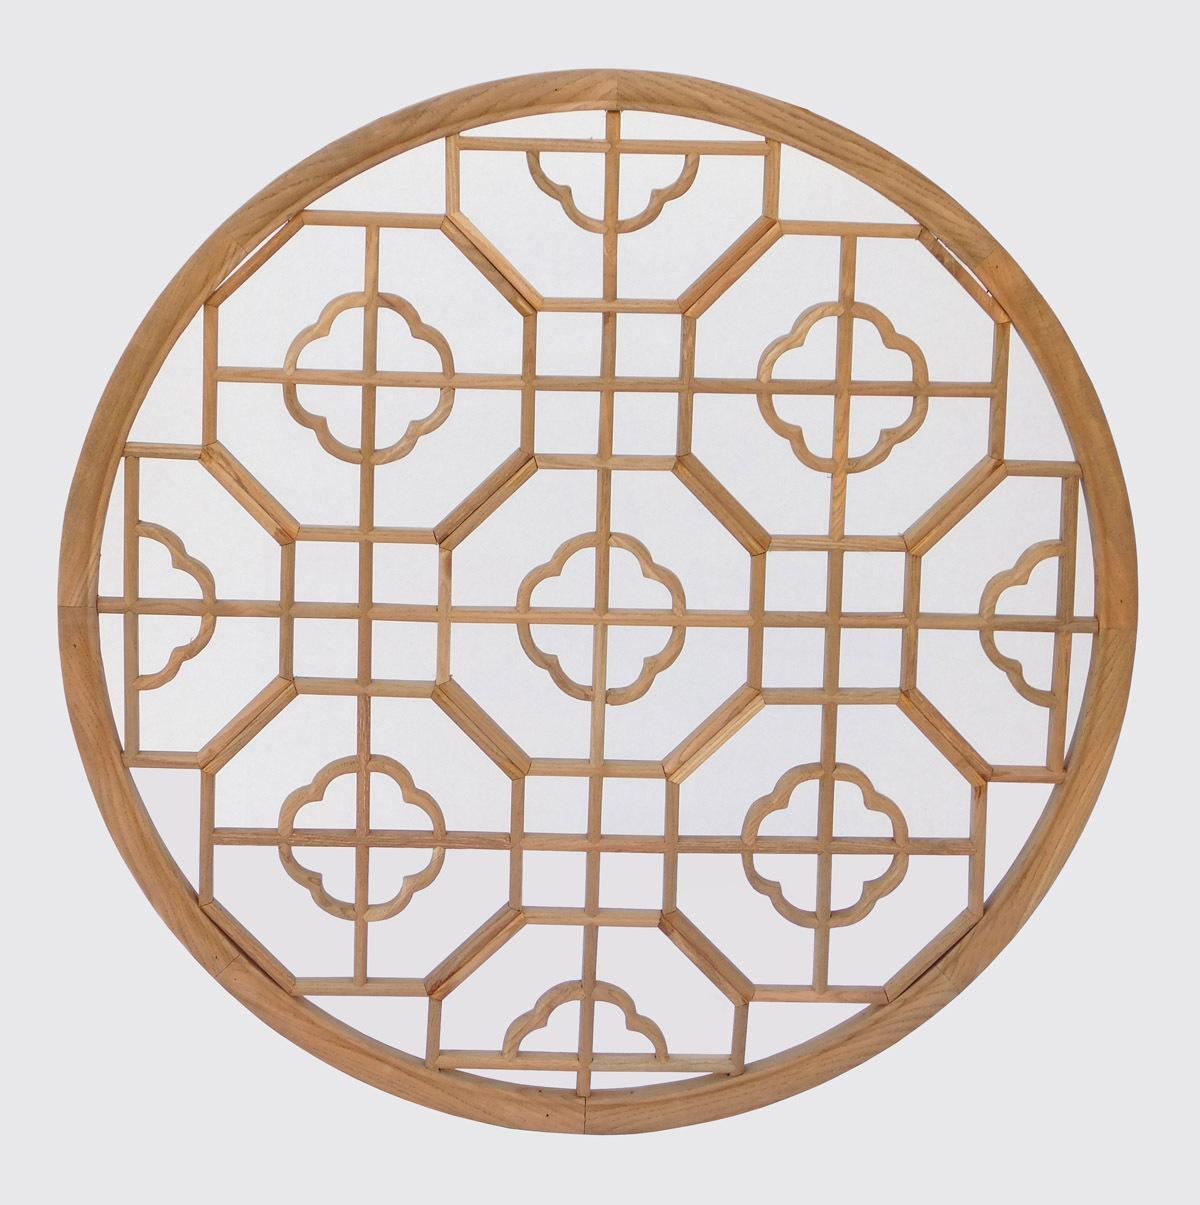 Chinese Round Flower Geometric Pattern Wall Panel cs2224